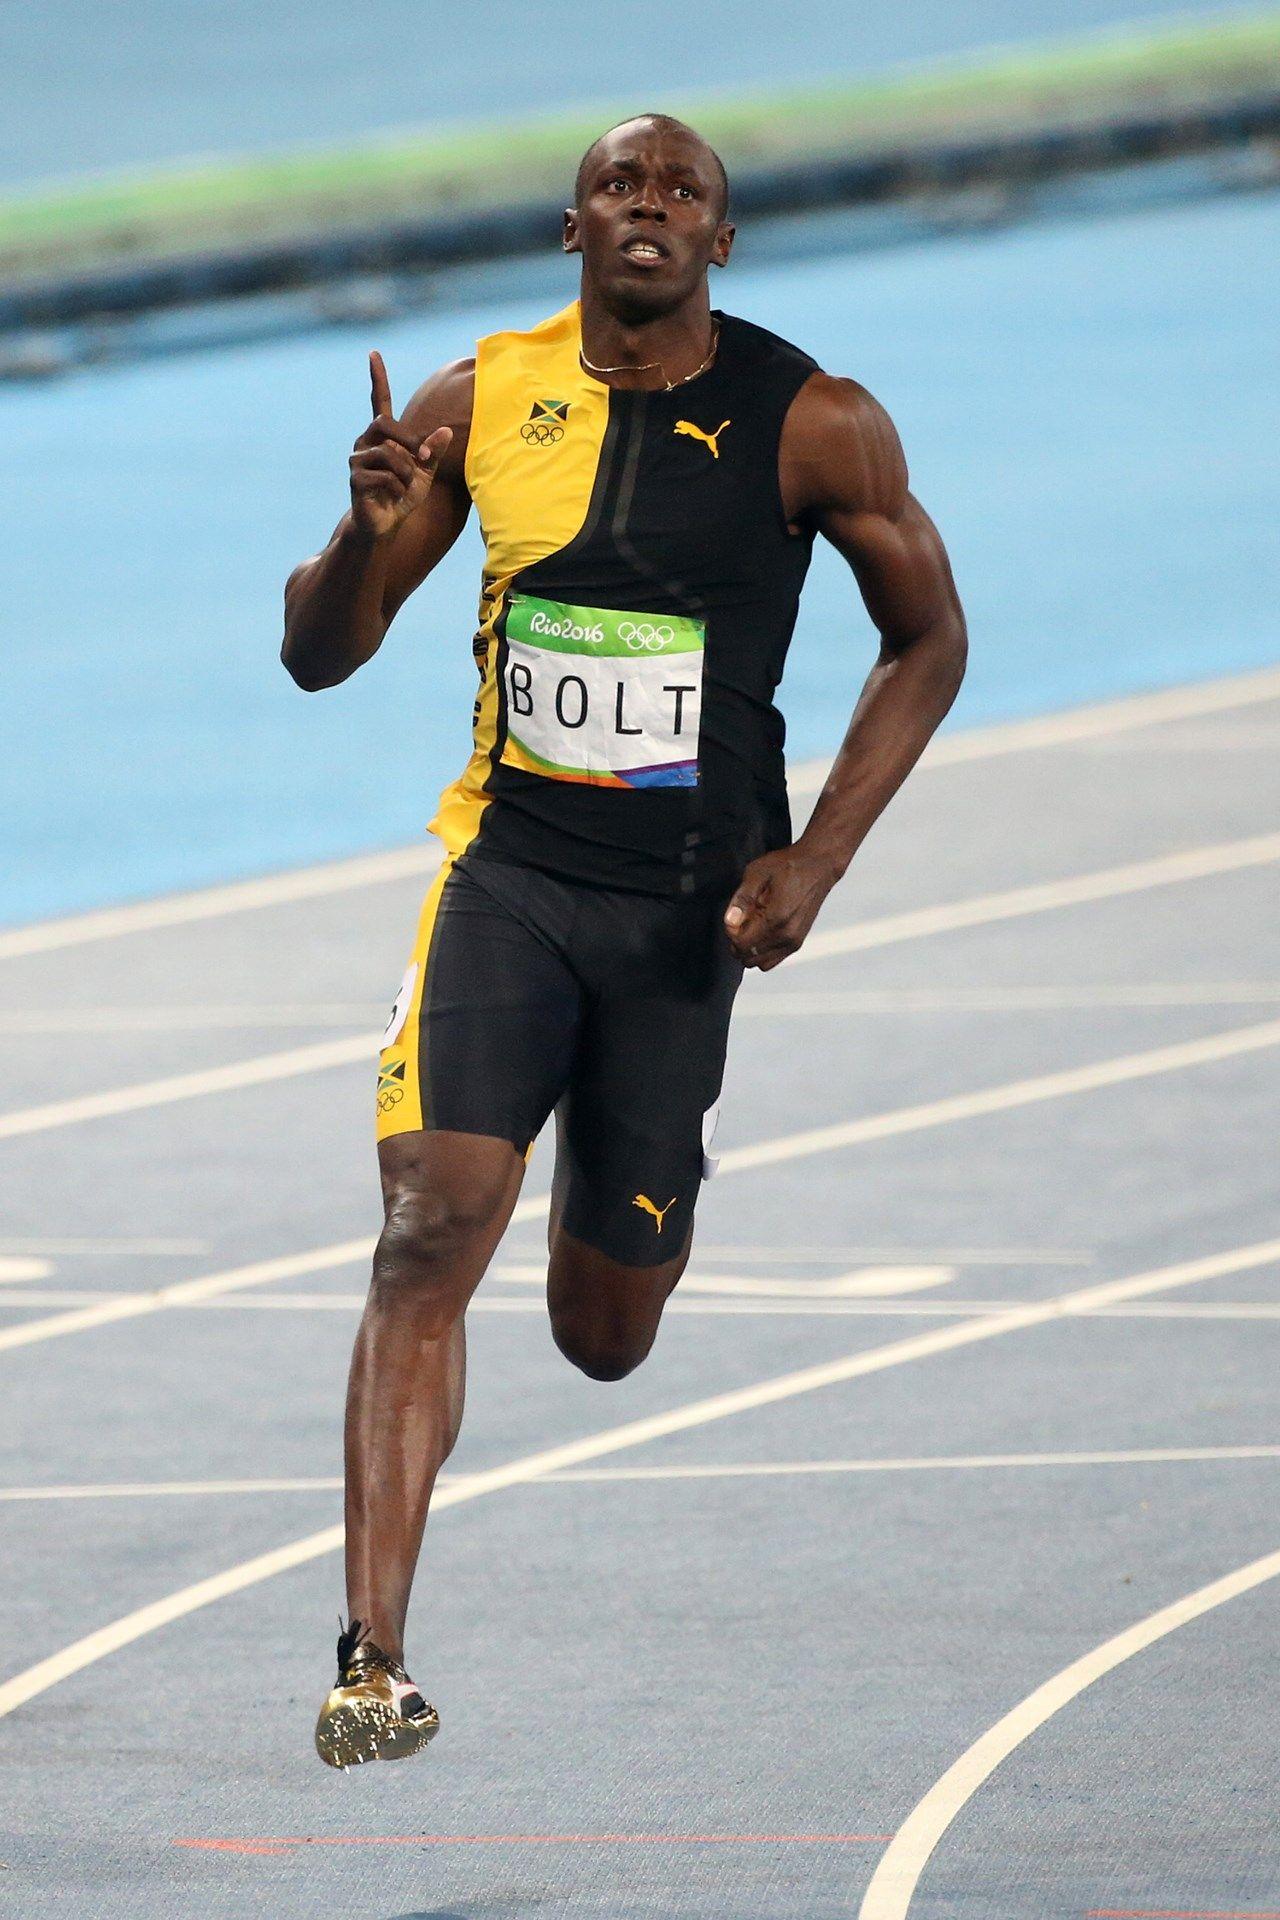 Rio Olympics Diary: Usain Bolt wins gold                                                                                                                                                                                 More